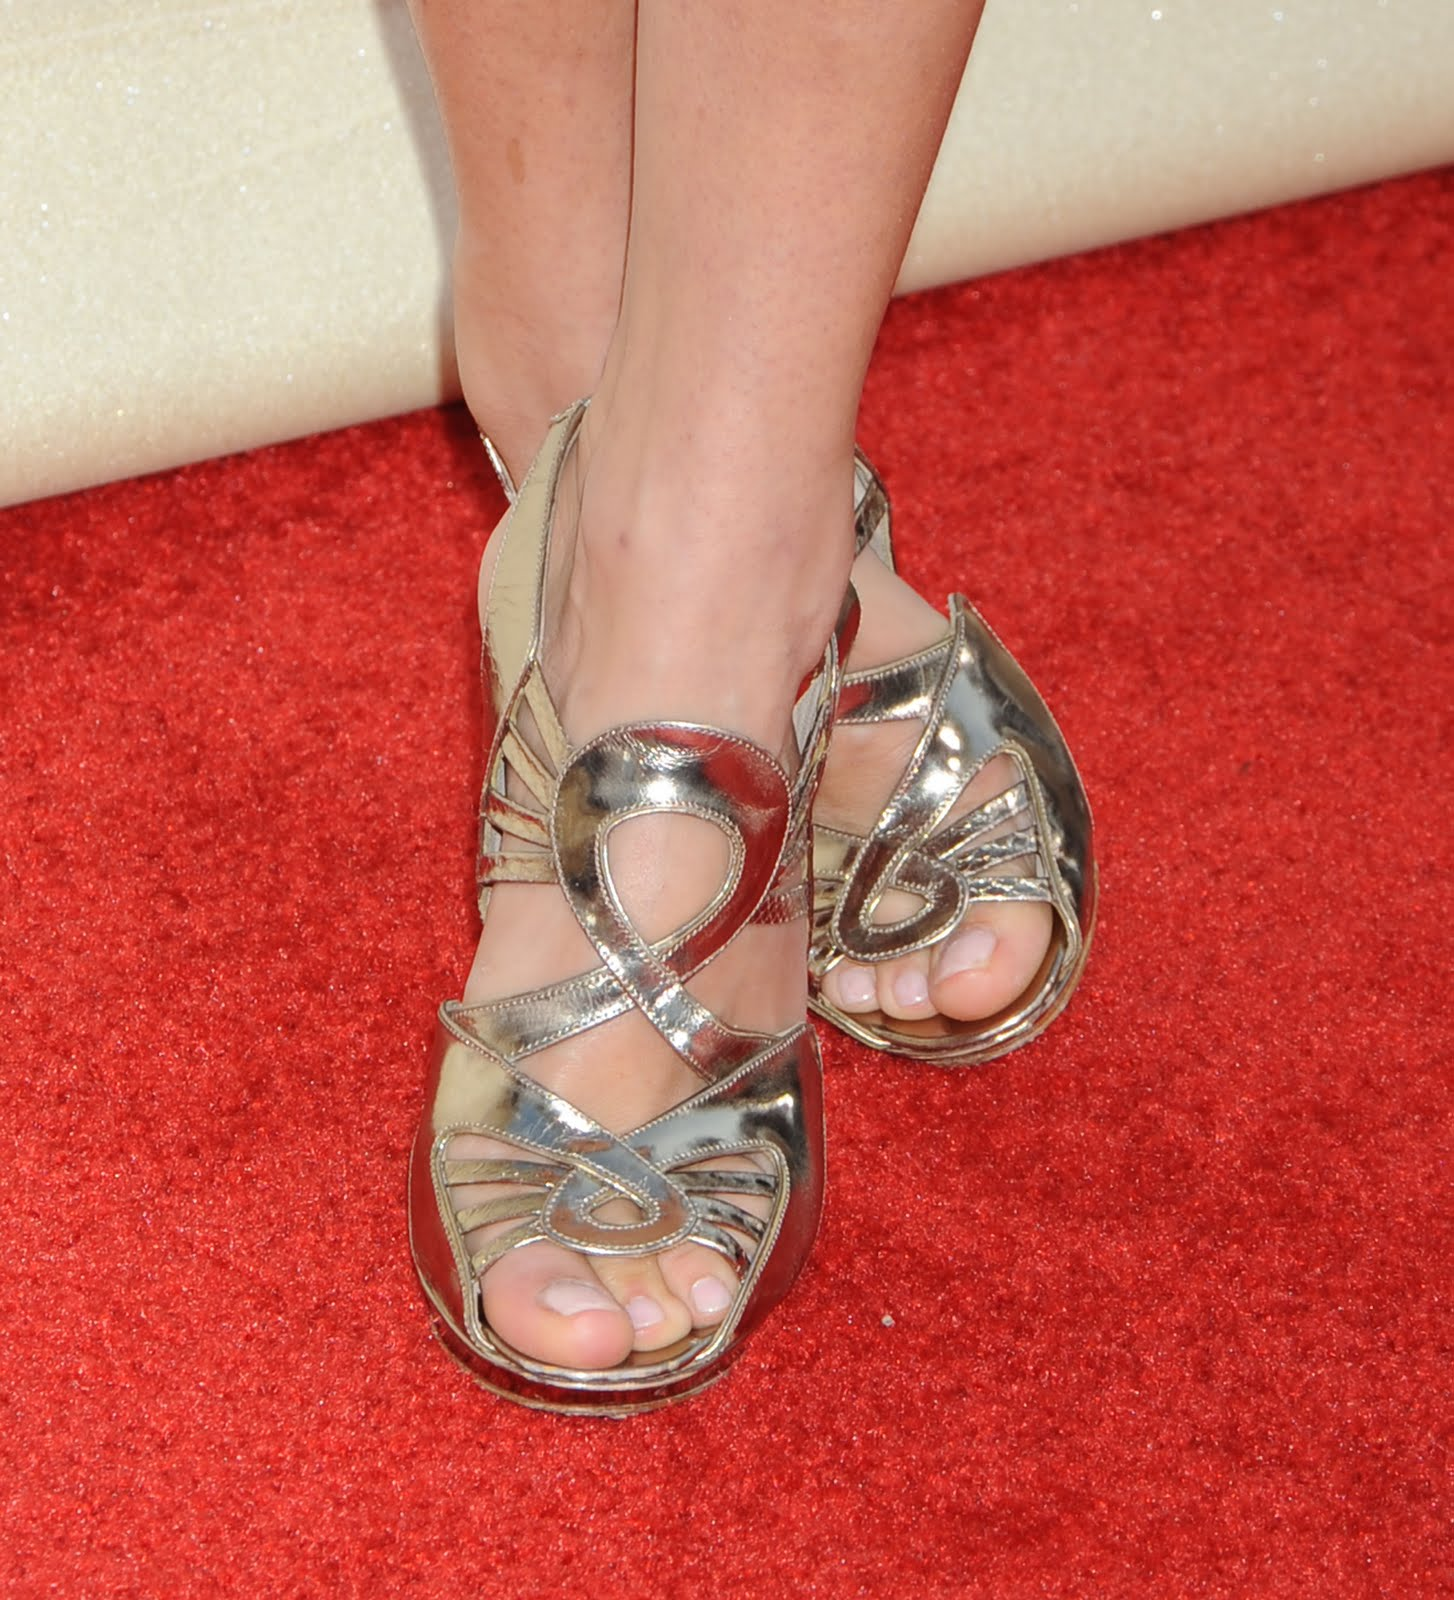 http://1.bp.blogspot.com/_UaLWp72nij4/TEdaVFAbGgI/AAAAAAAAR5k/sTeNY336fTI/s1600/sienna-miller-feet-4.jpg